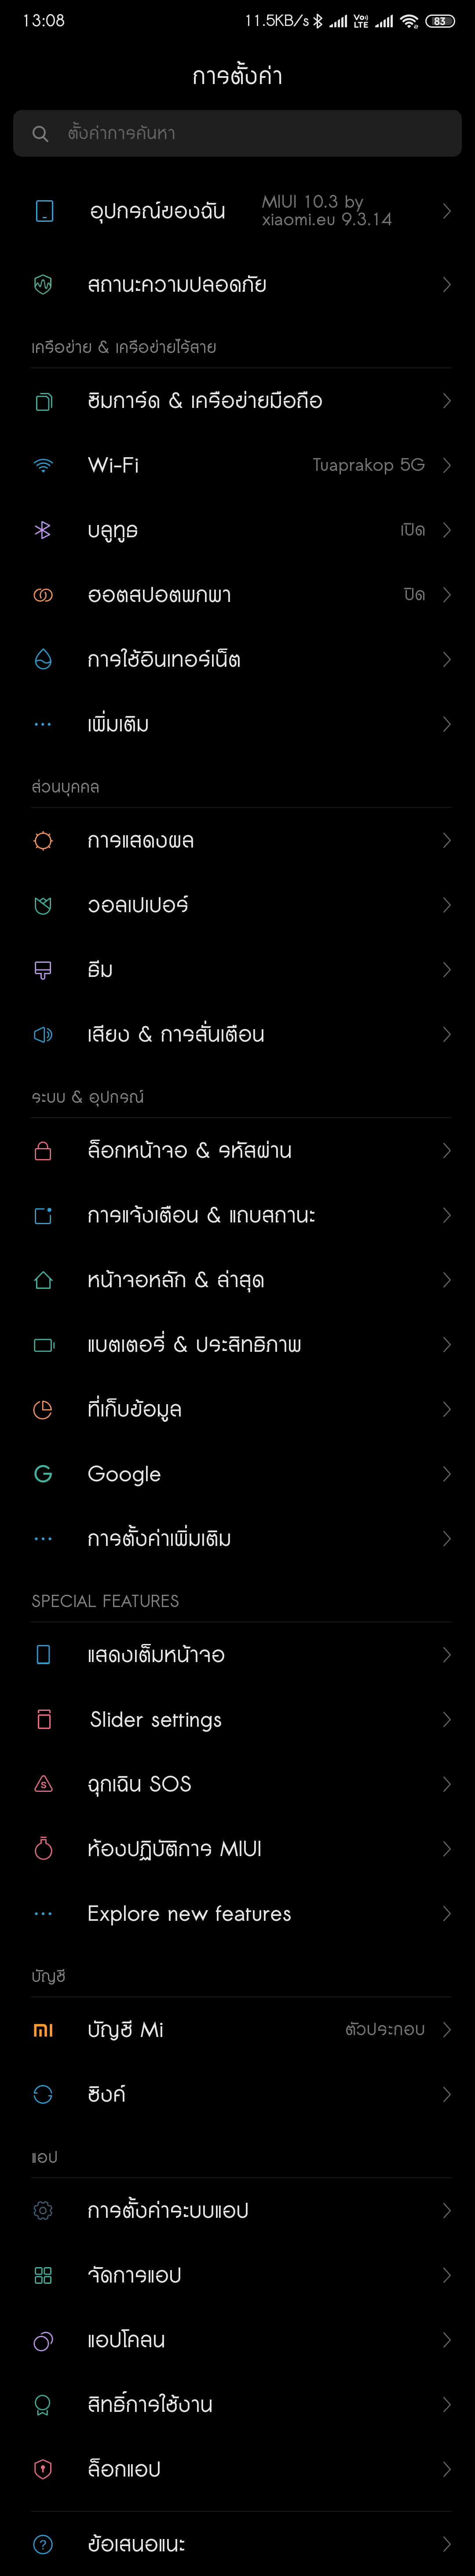 Screenshot_2019-03-15-13-08-03-427_com.android.settings.png